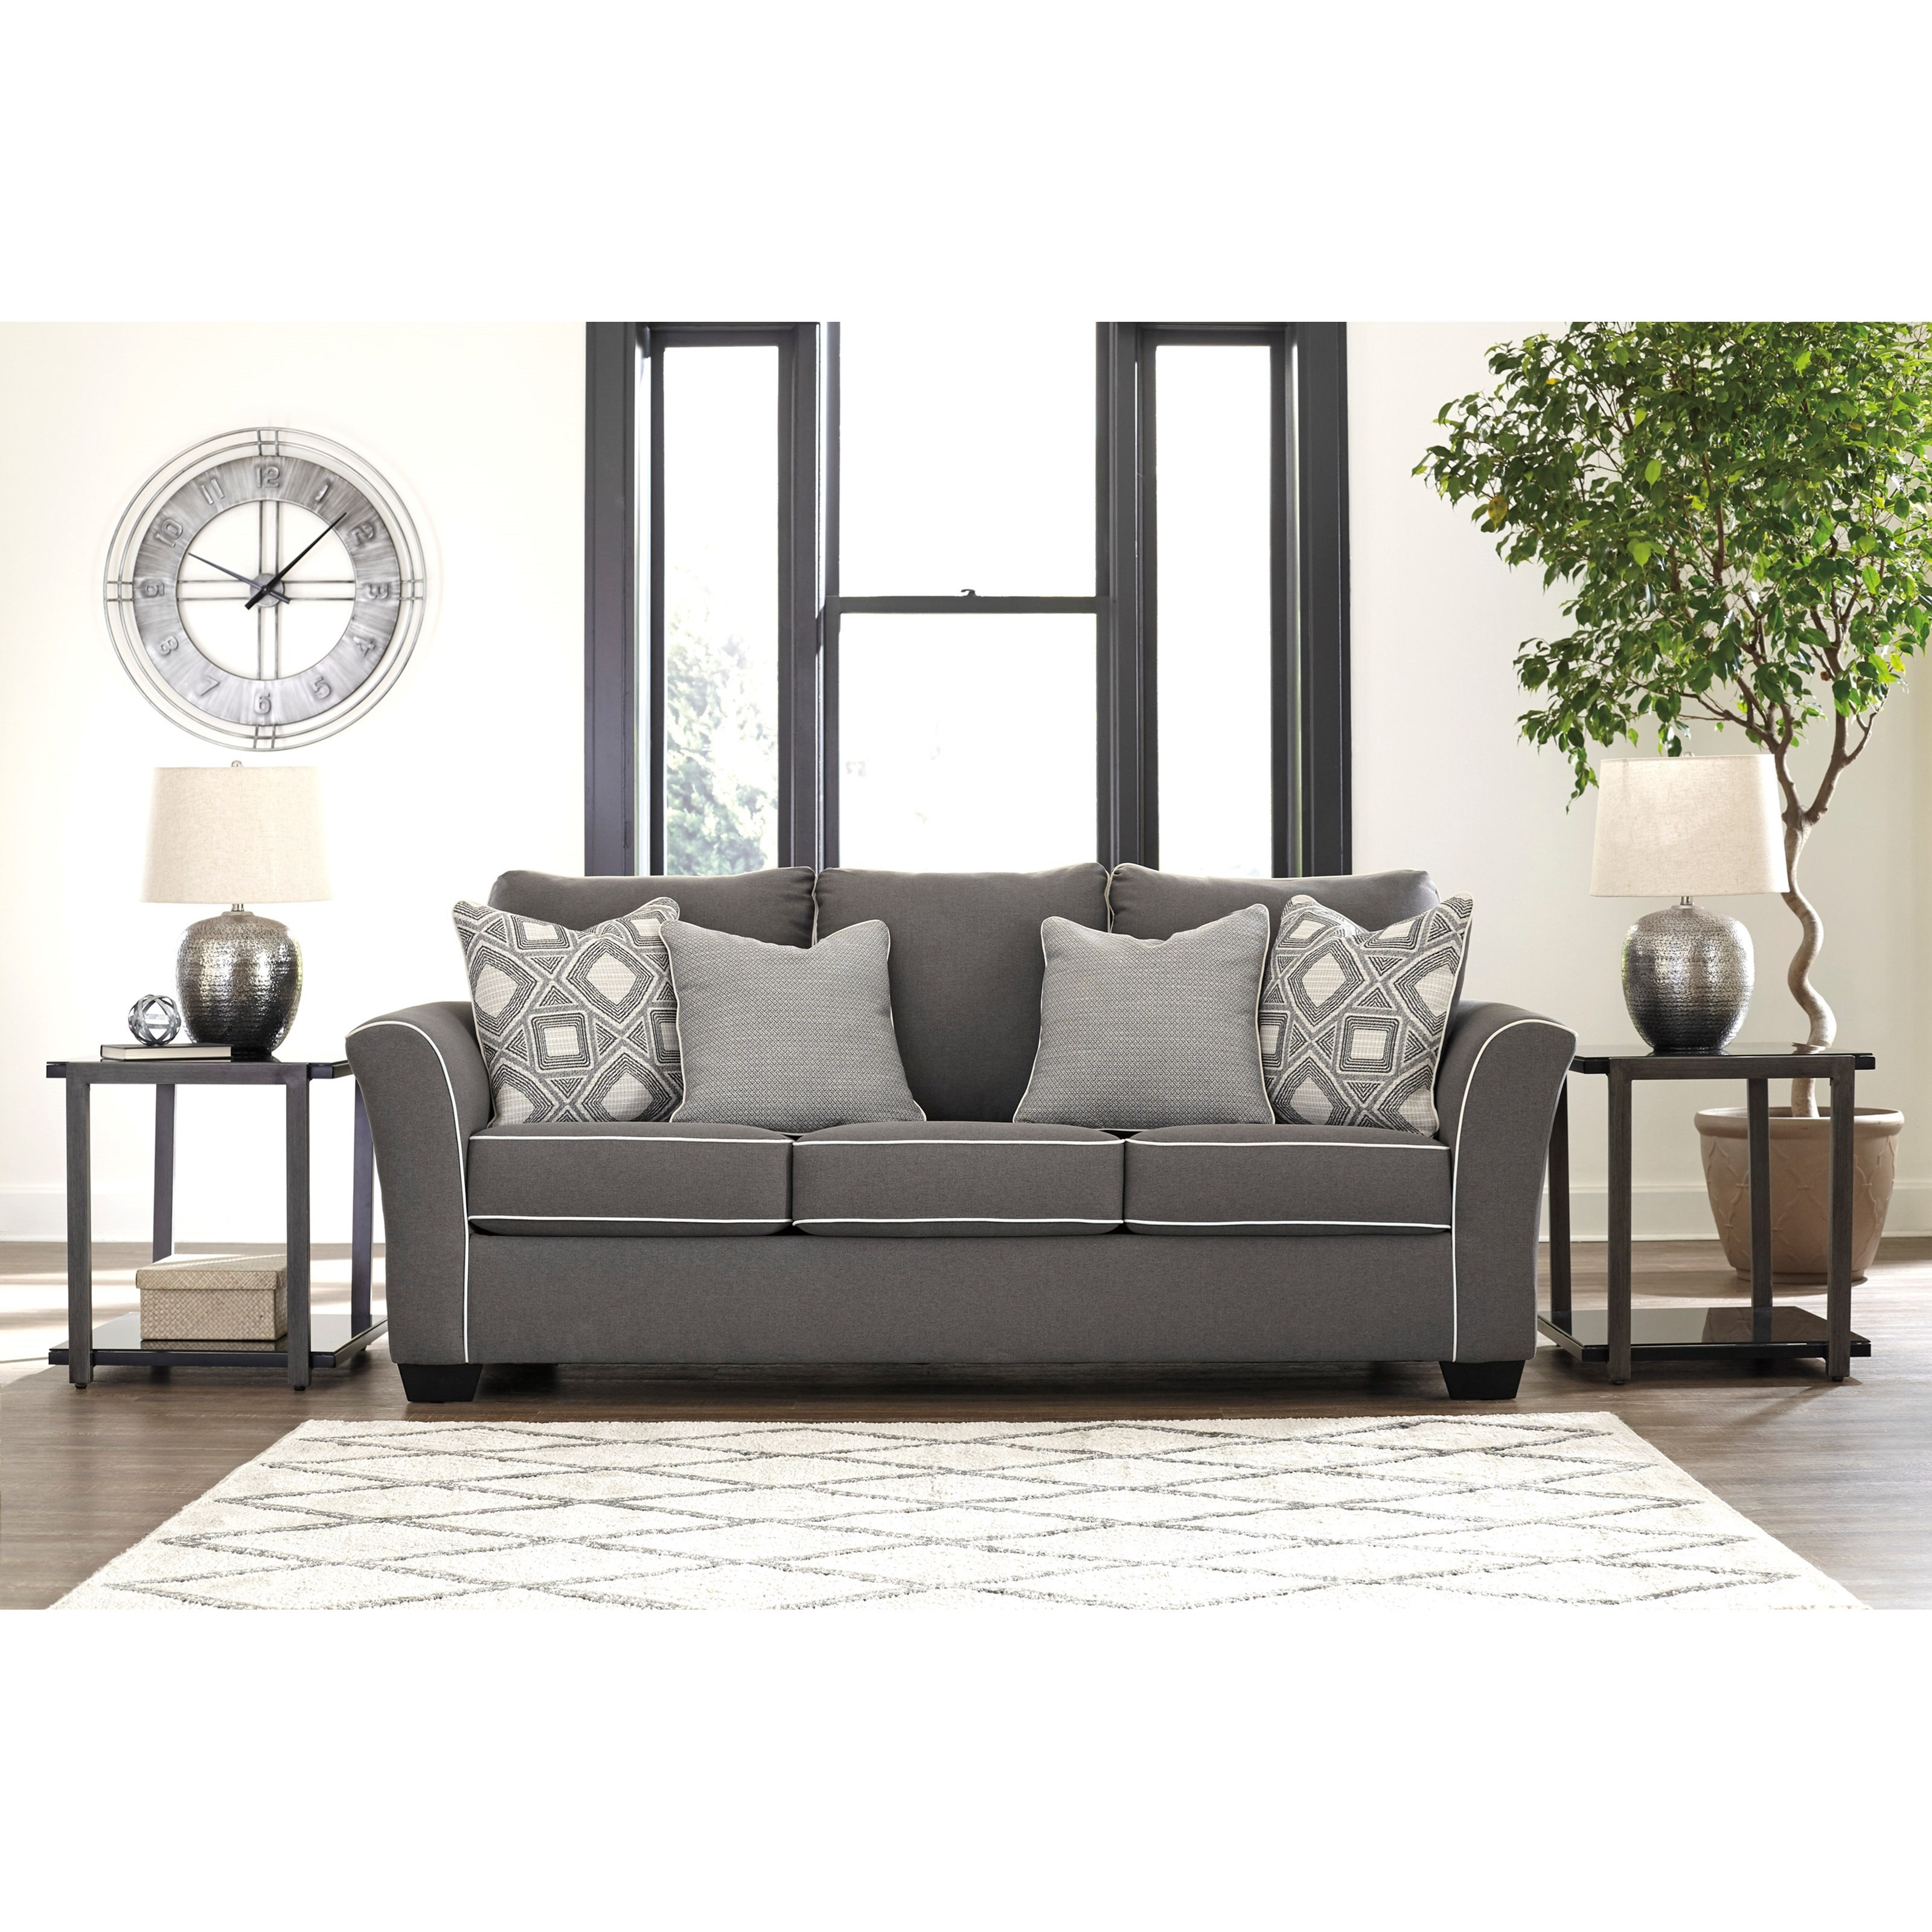 Signature Design Domani Contemporary Queen Sofa Sleeper